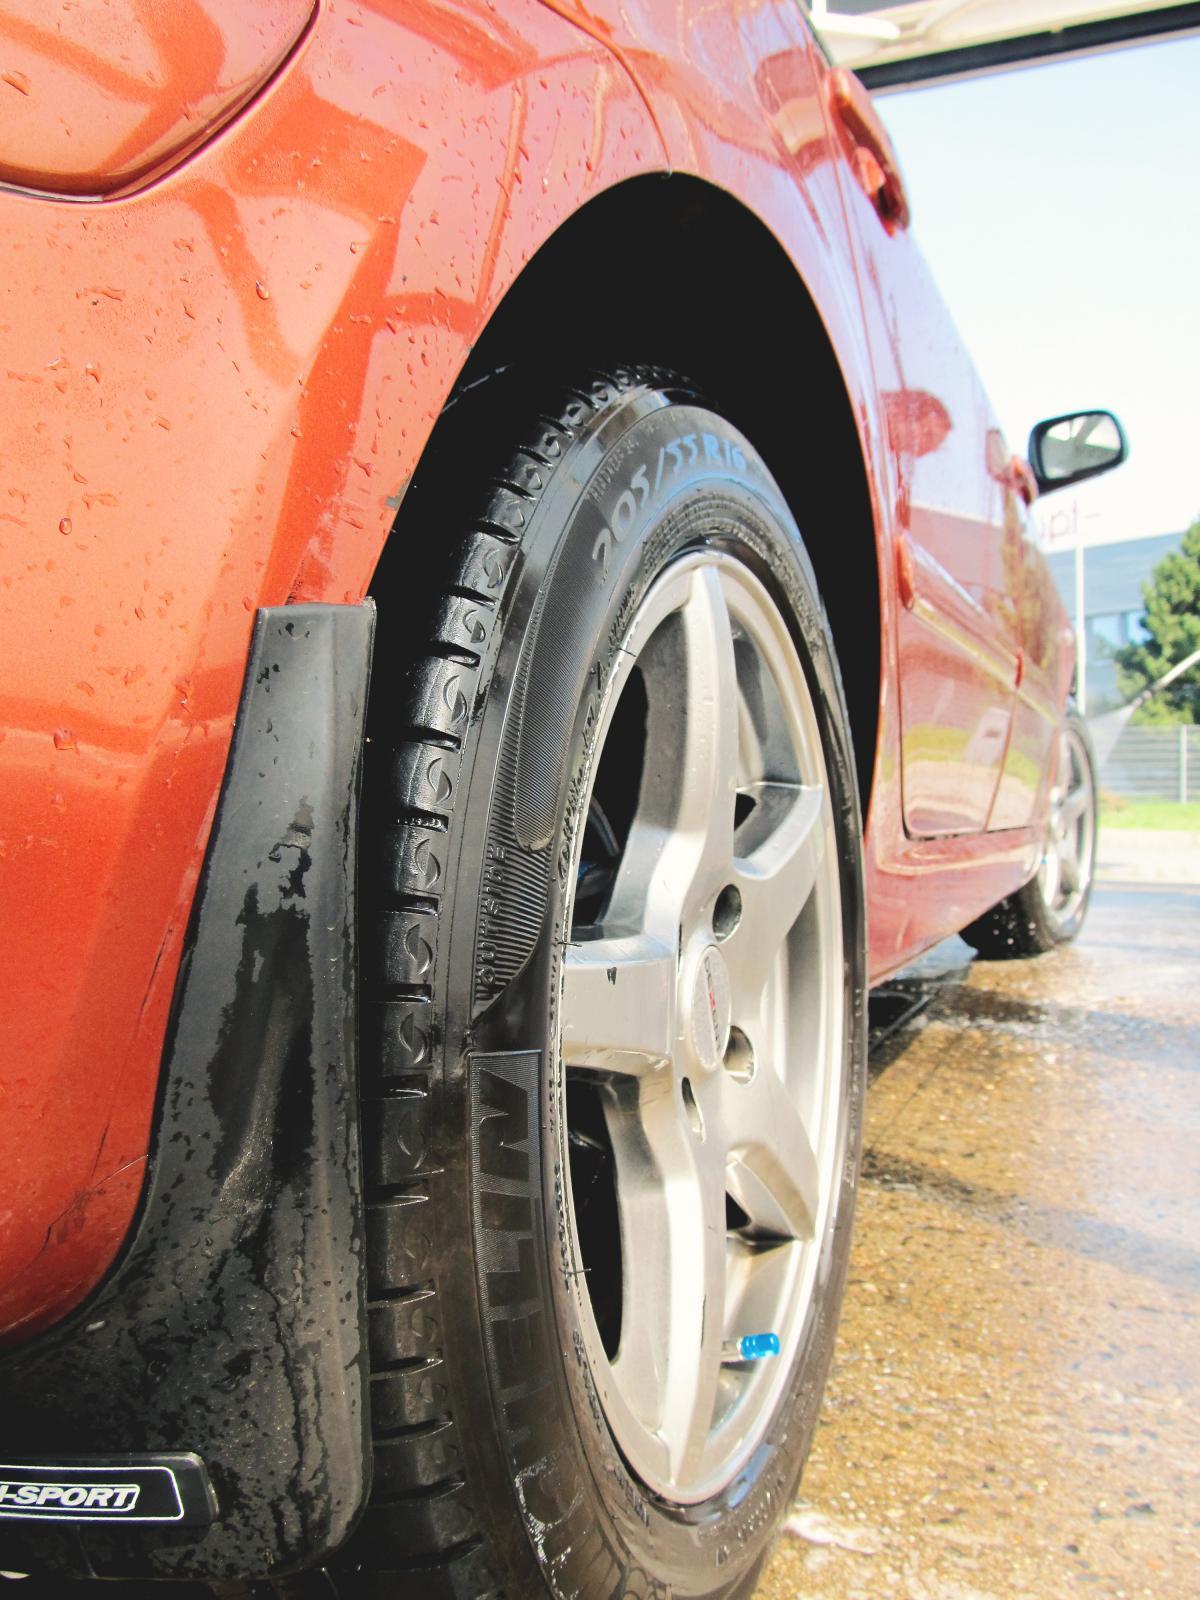 Car wash wheels rims  #21265